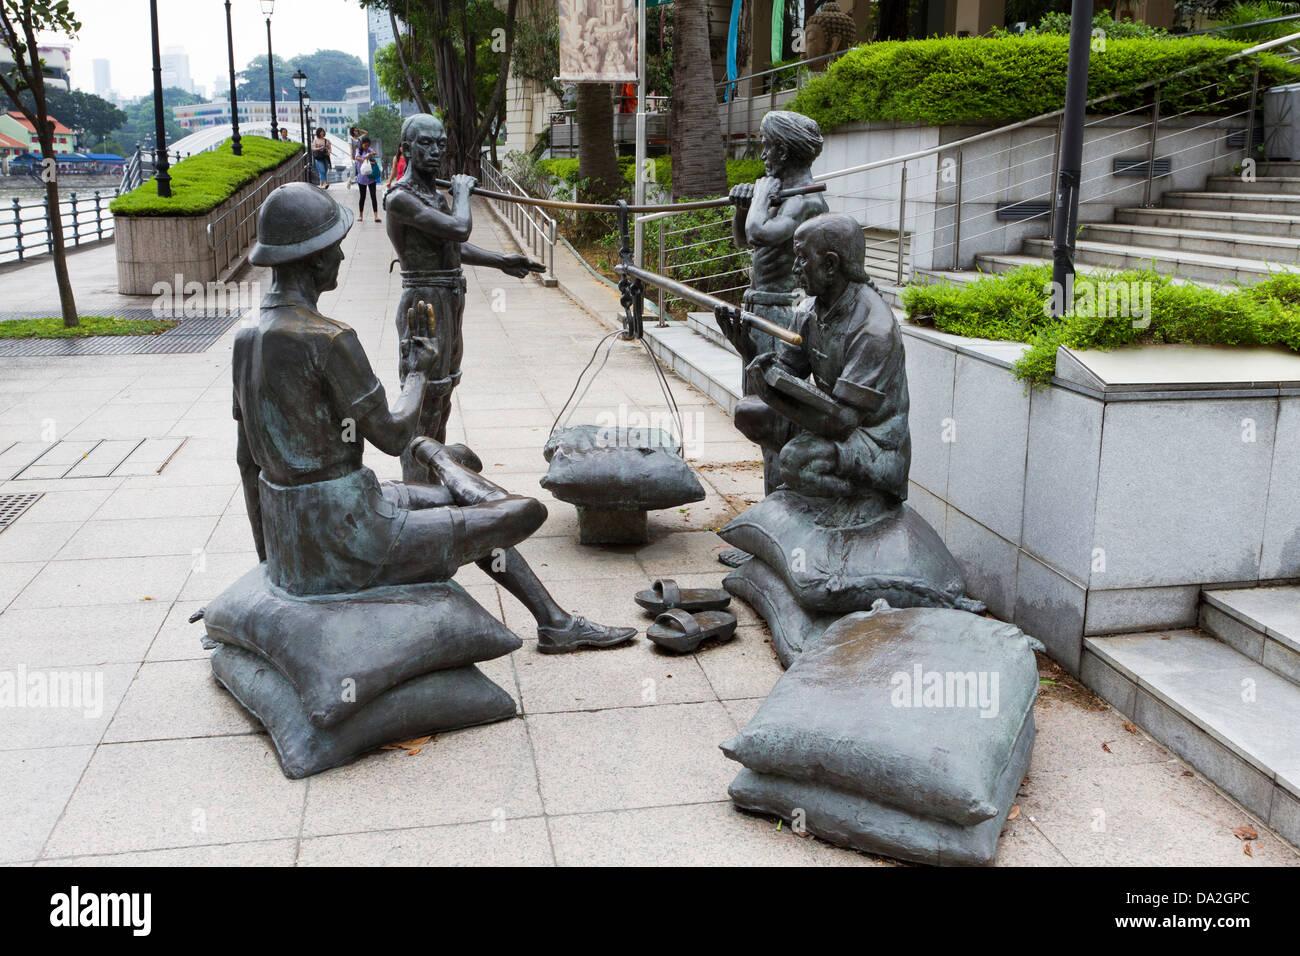 Bronze statues, Boat Quay, Singapore - Stock Image